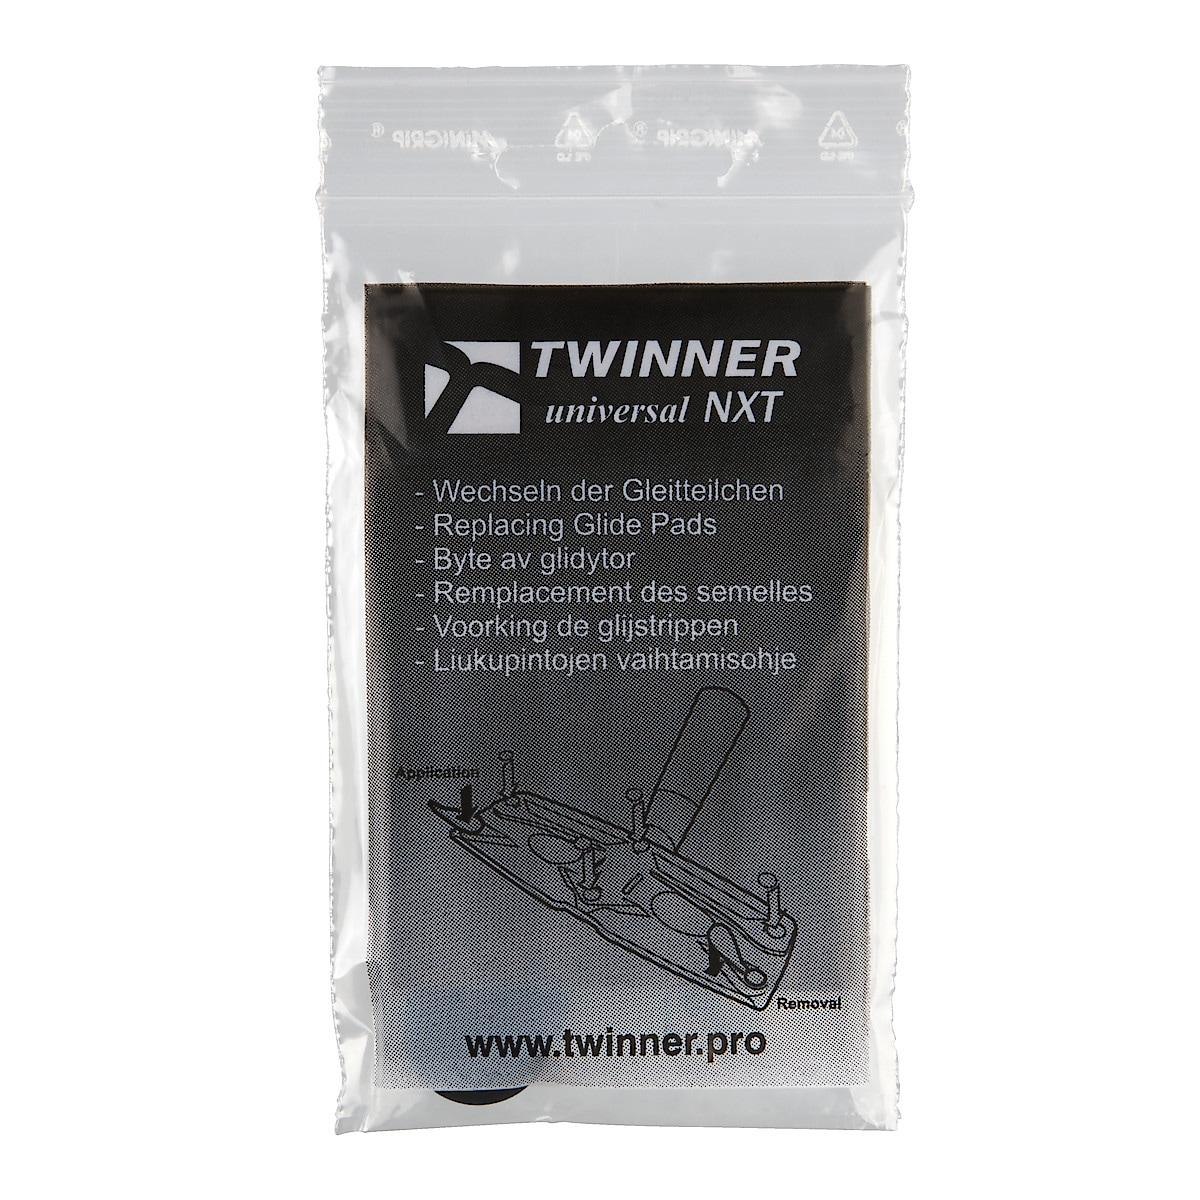 Glidytor till Twinner NXT